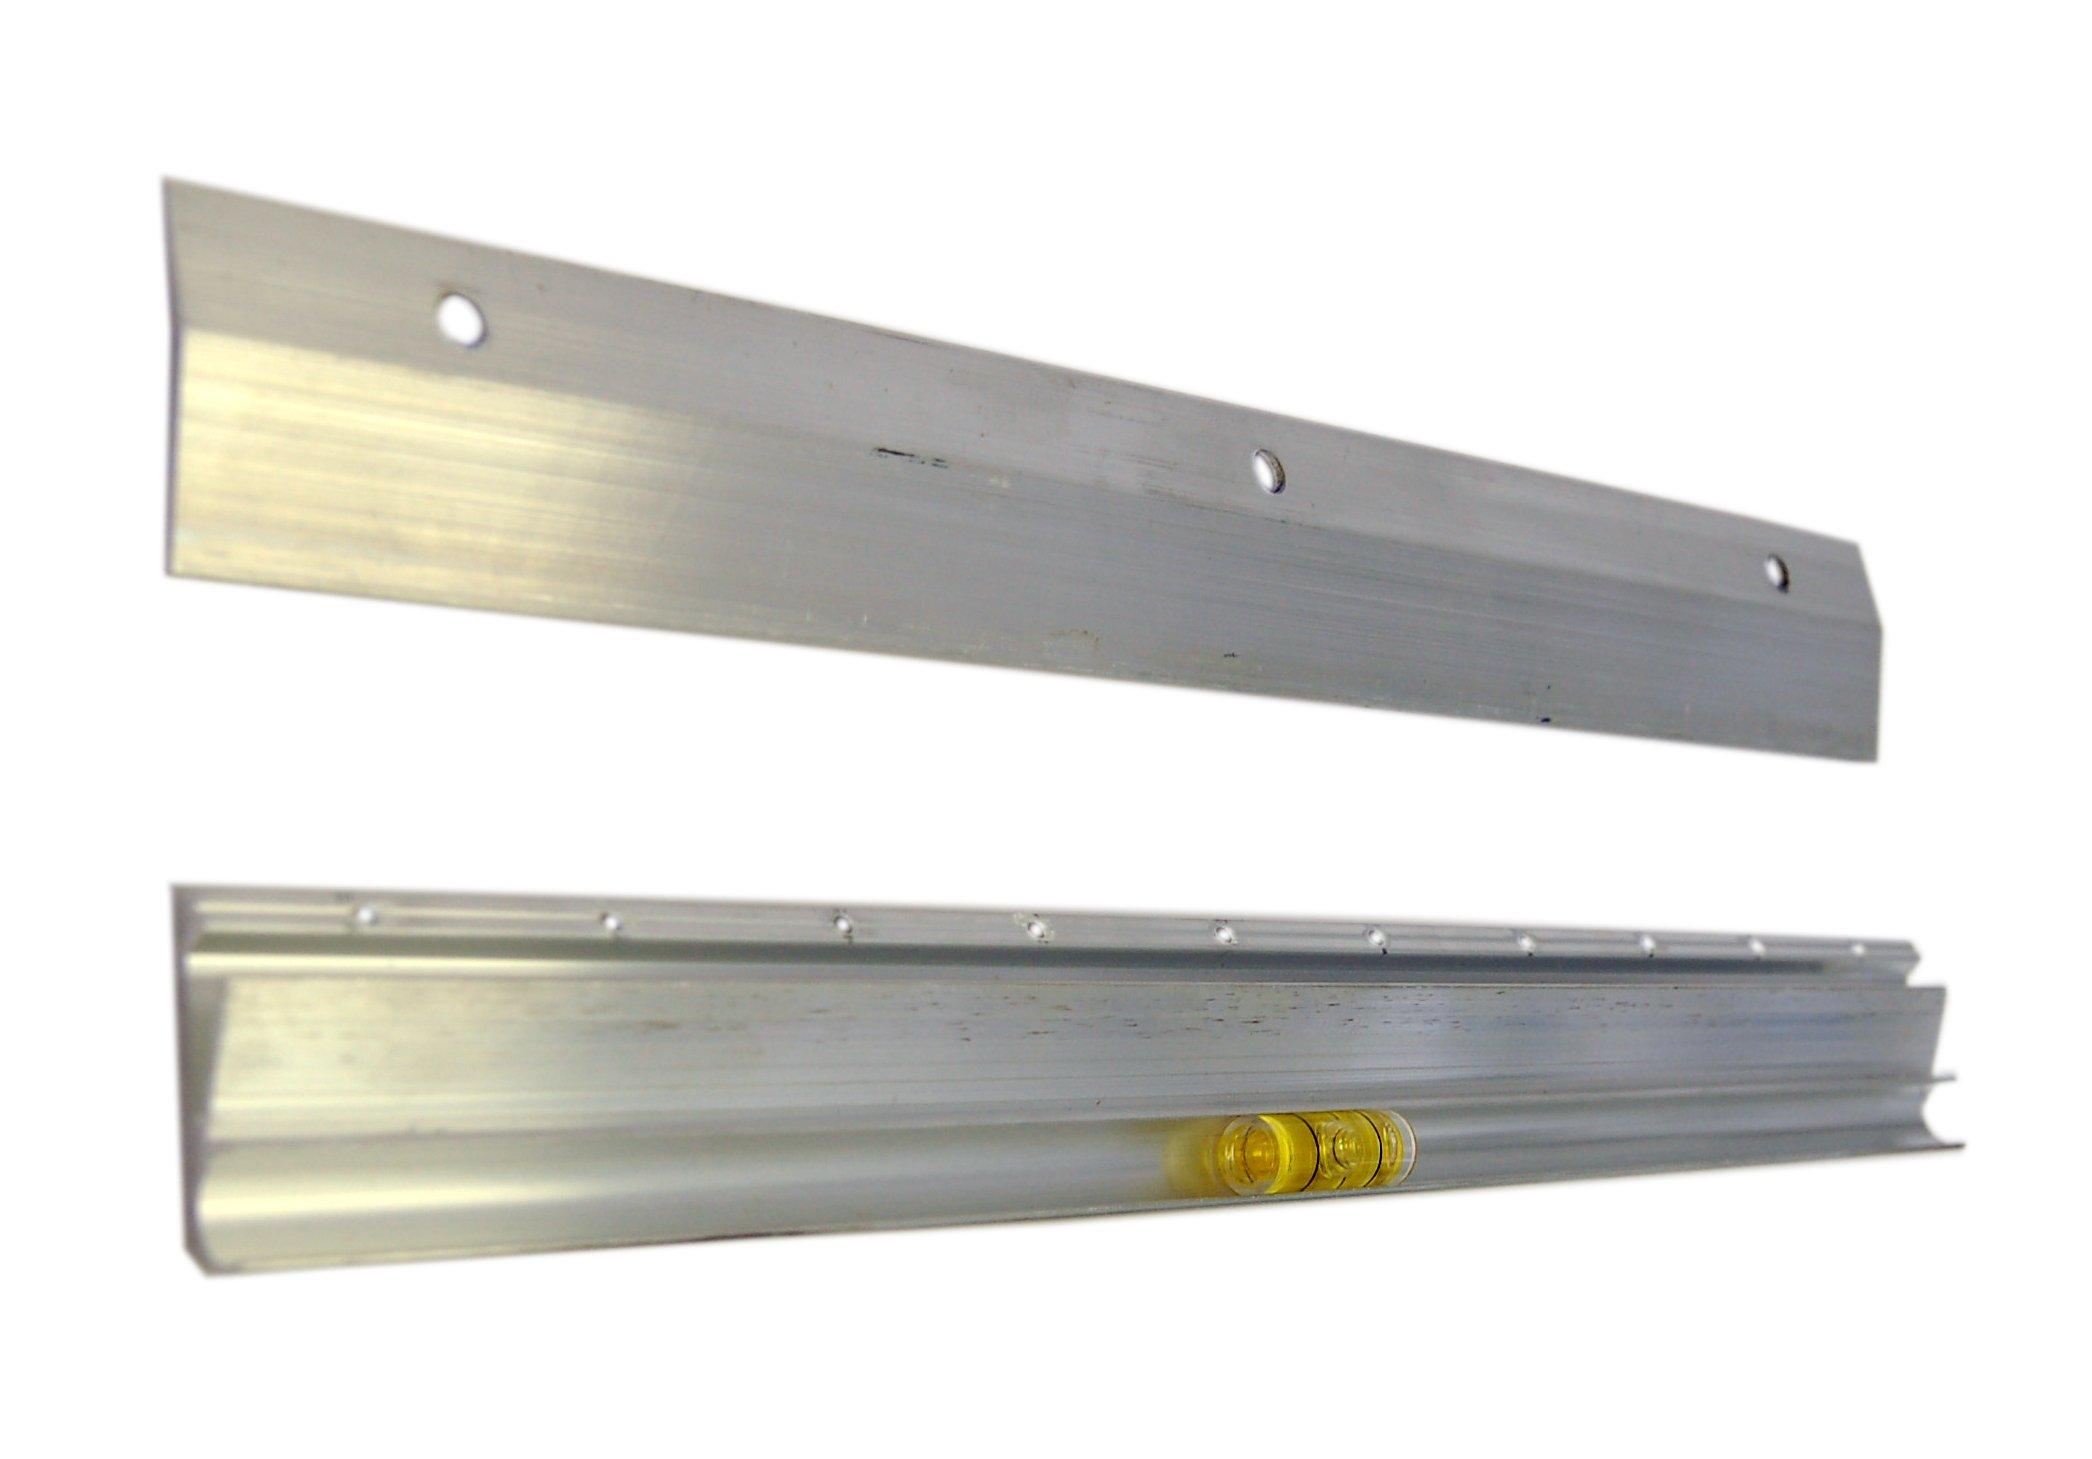 Hangman Softy - Heavy Duty Frame Hanger with Minimal Wall Damage: SFT-30